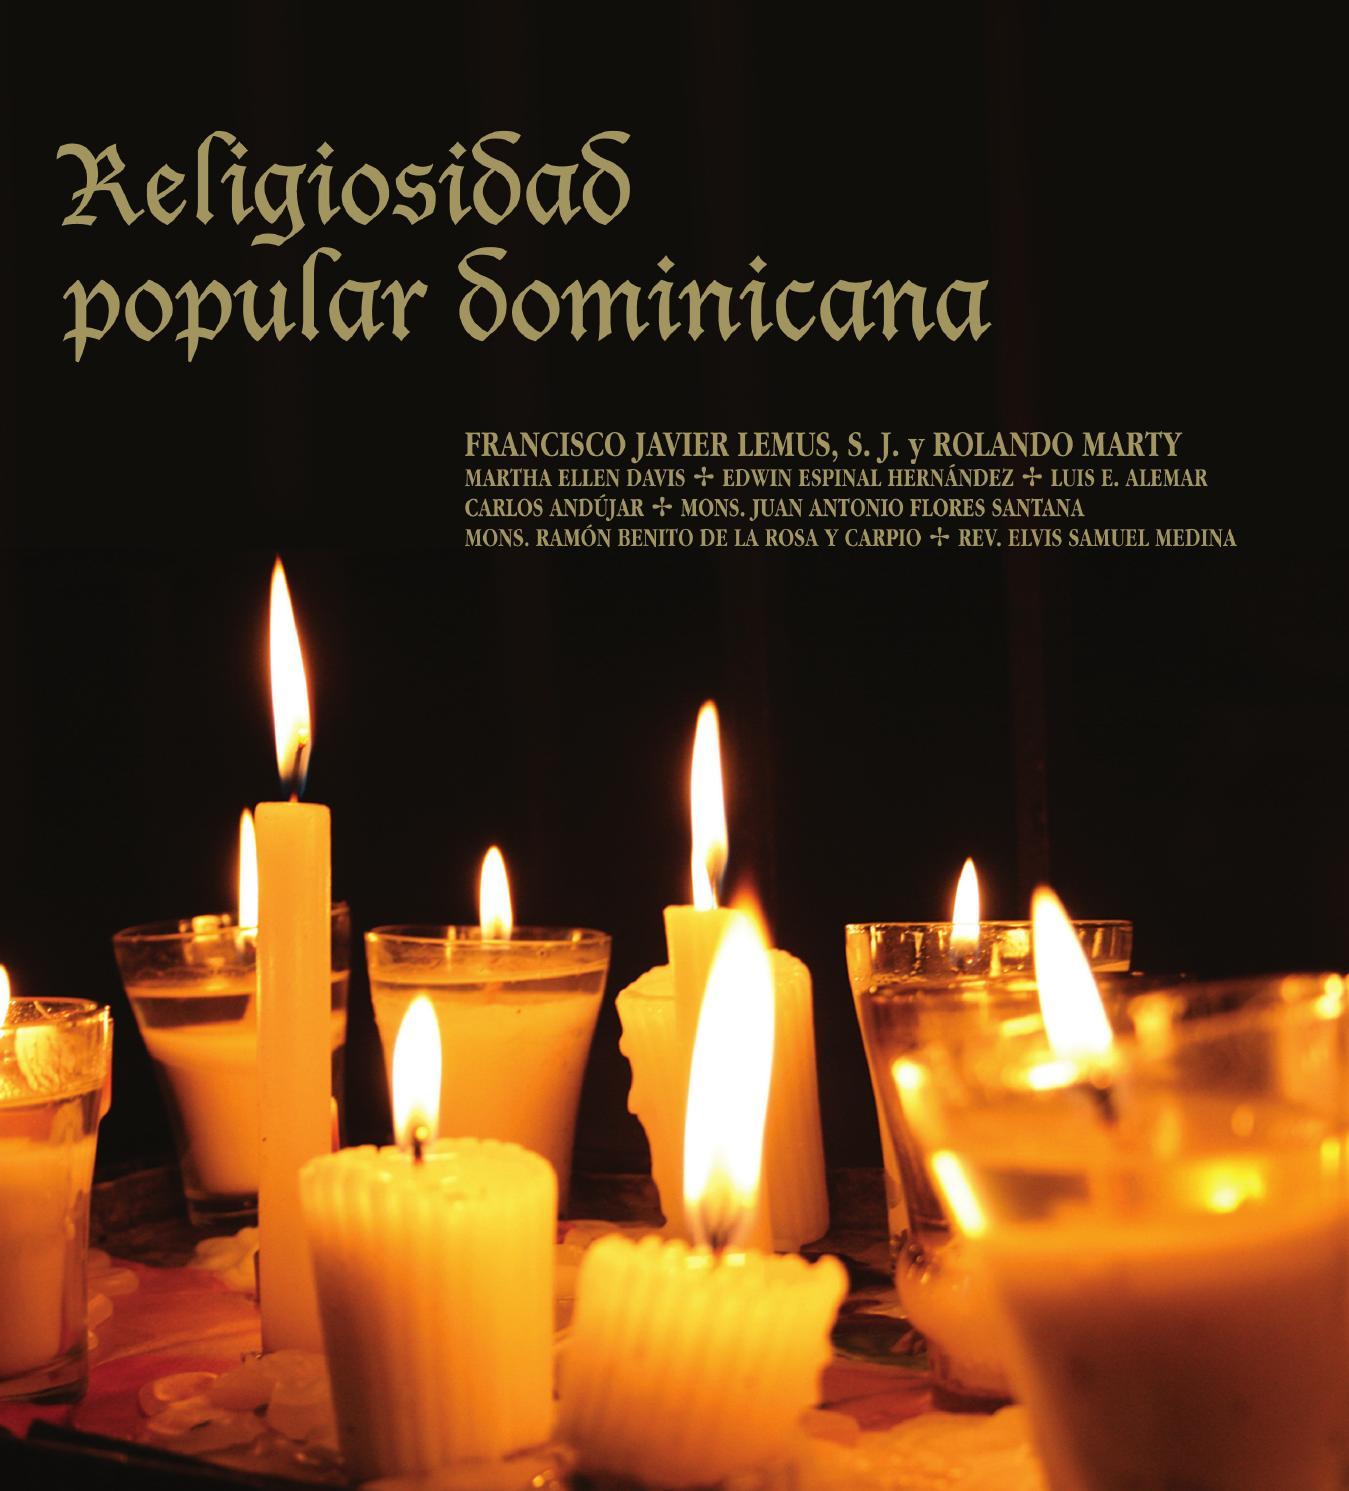 Religiosidad Popular Dominicana by Banco Popular Dominicano - issuu 4ee65582ef6